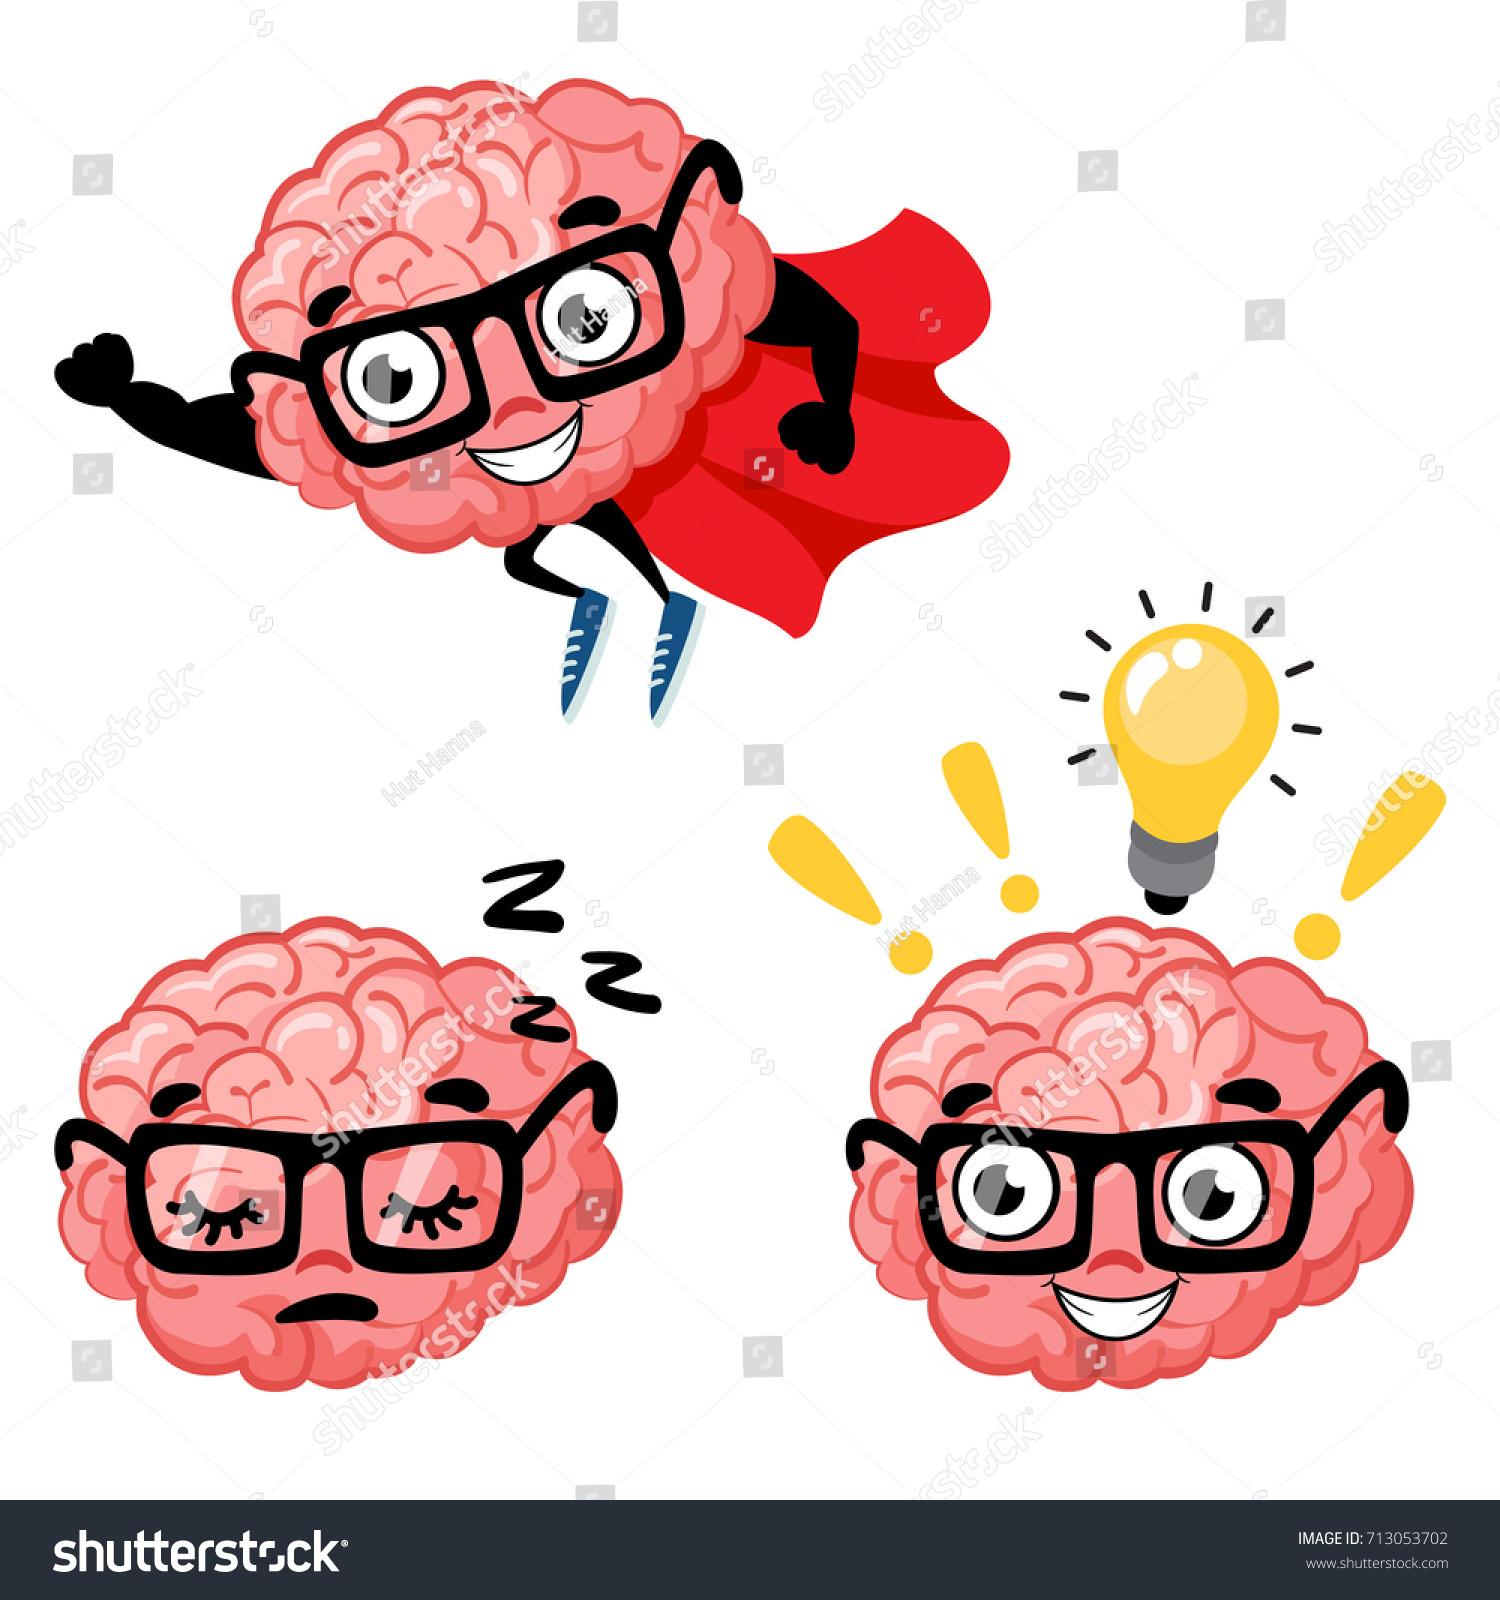 Set Cute Cartoon Smart Brains Cartoon Stock Vector 713053702 ... for Smart Cartoon Brain  146hul